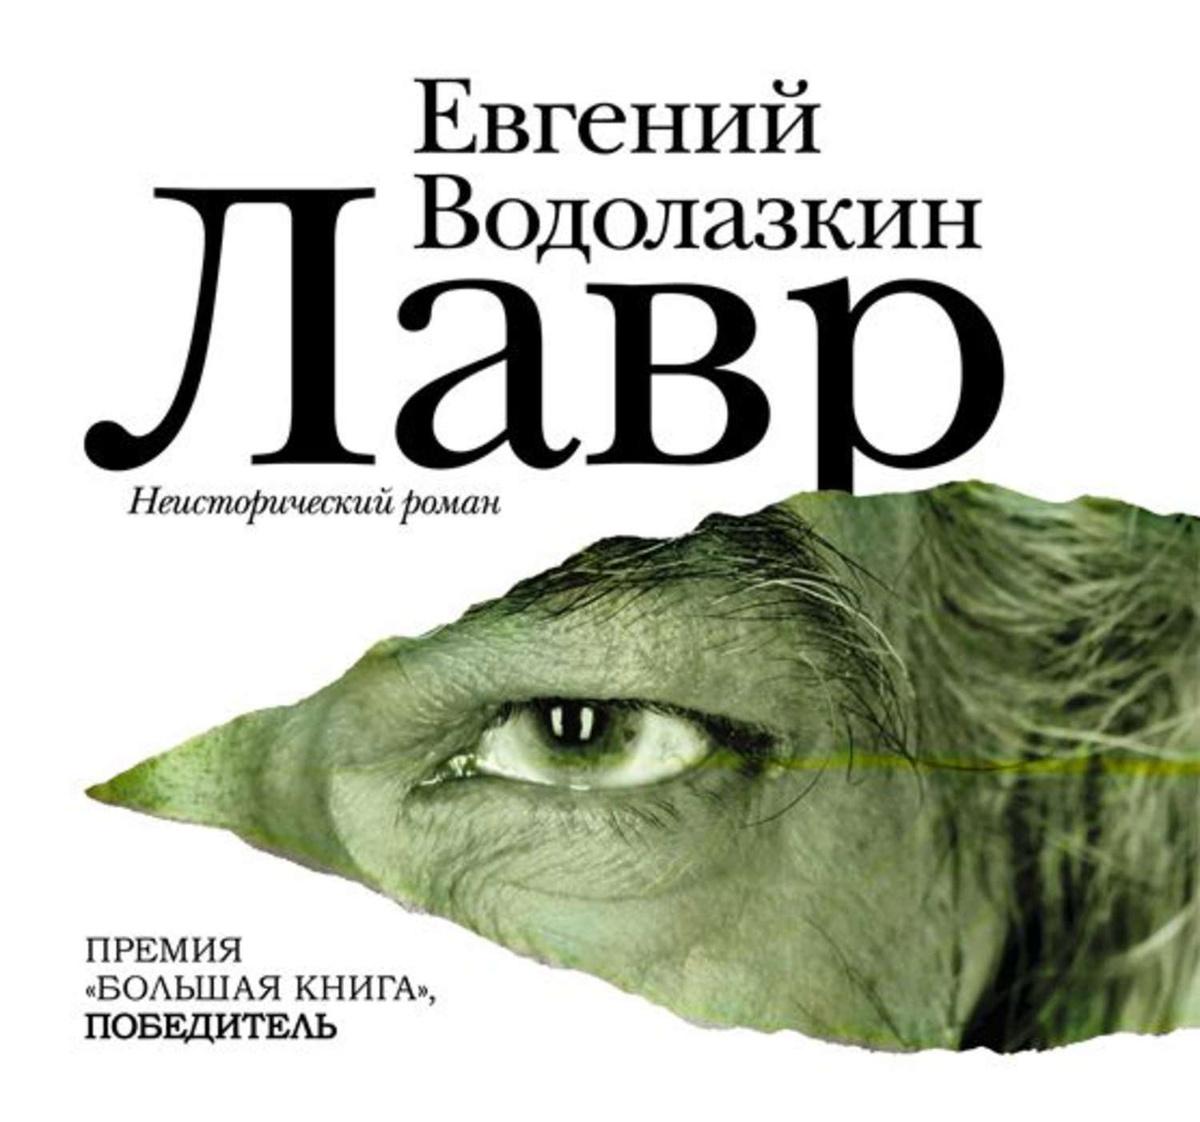 Лавр | Водолазкин Евгений Германович #1